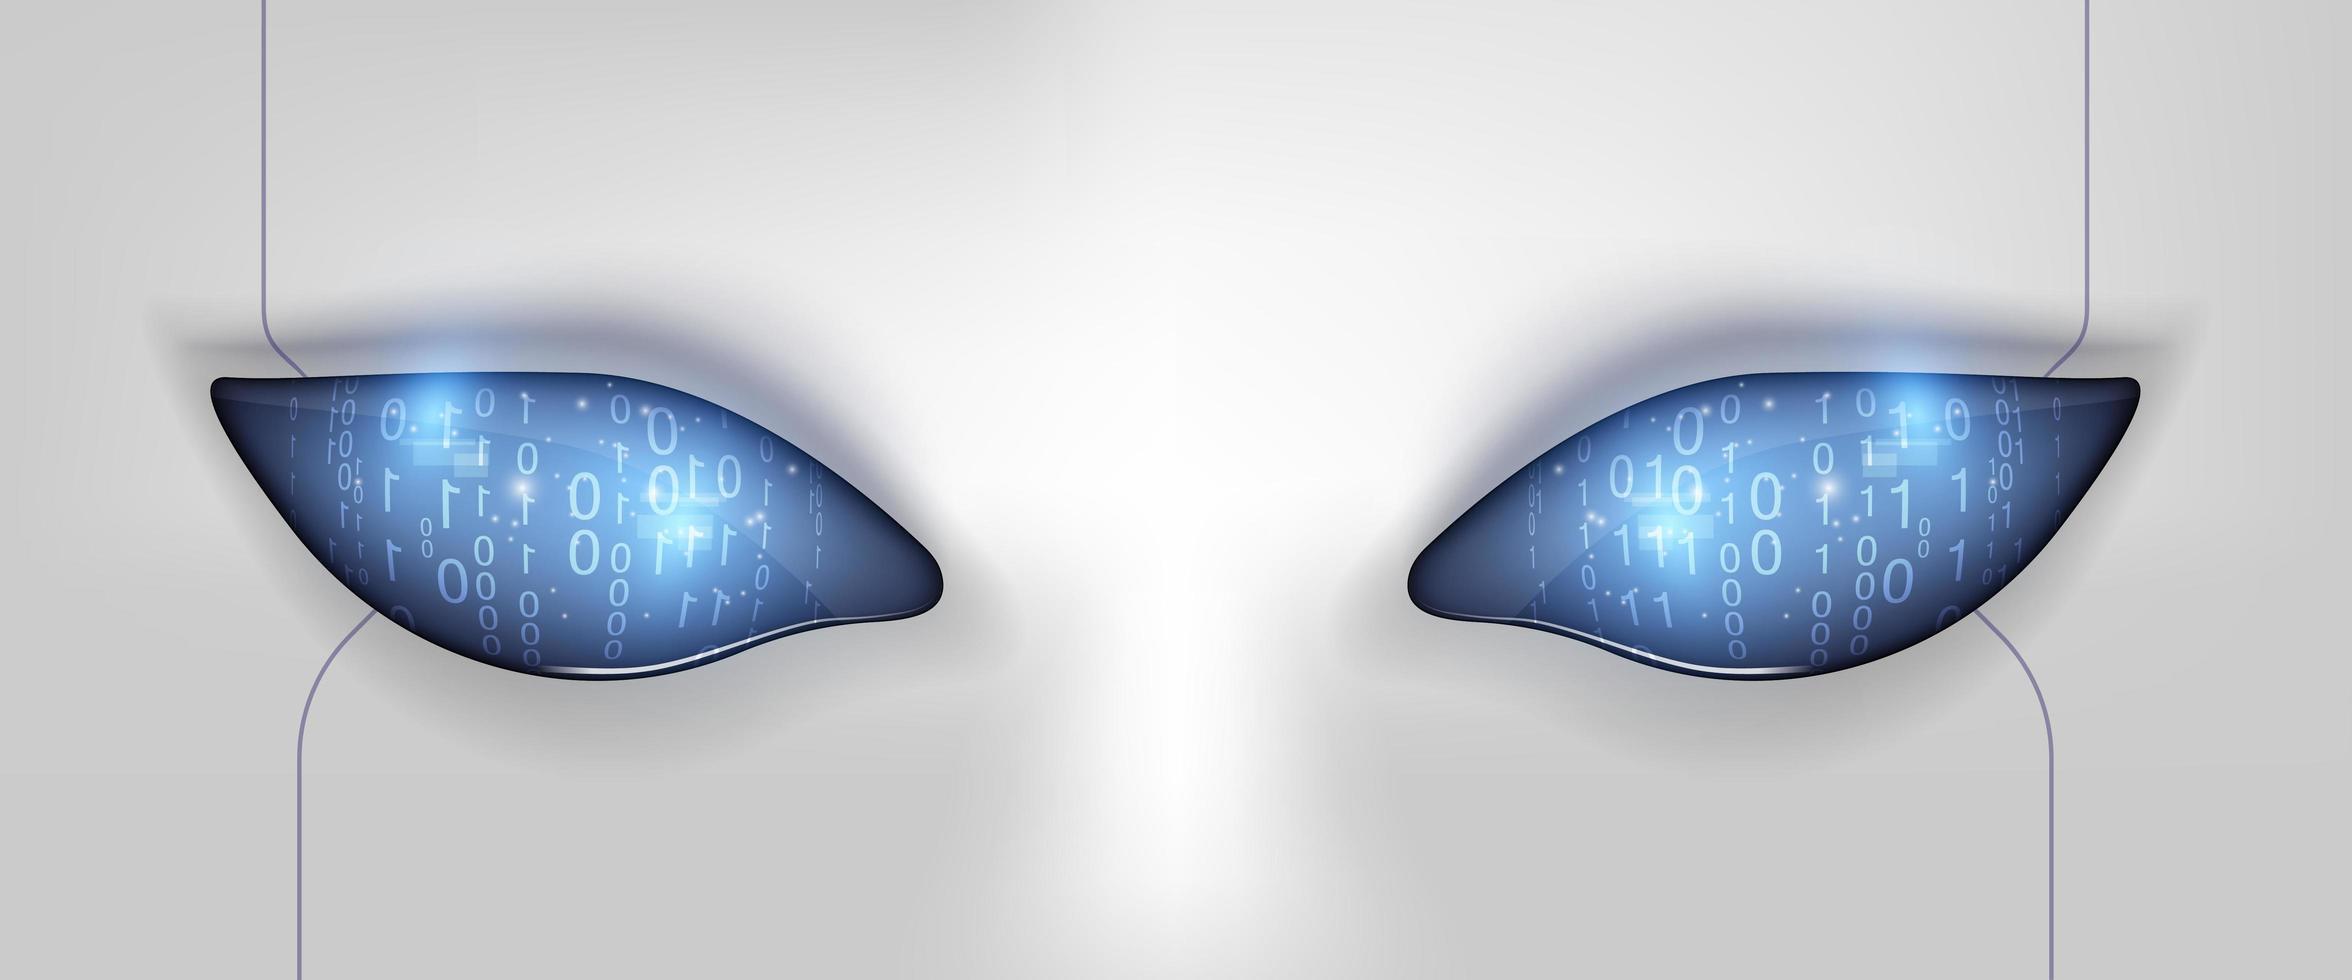 œil du robot. interface hud futuriste vecteur